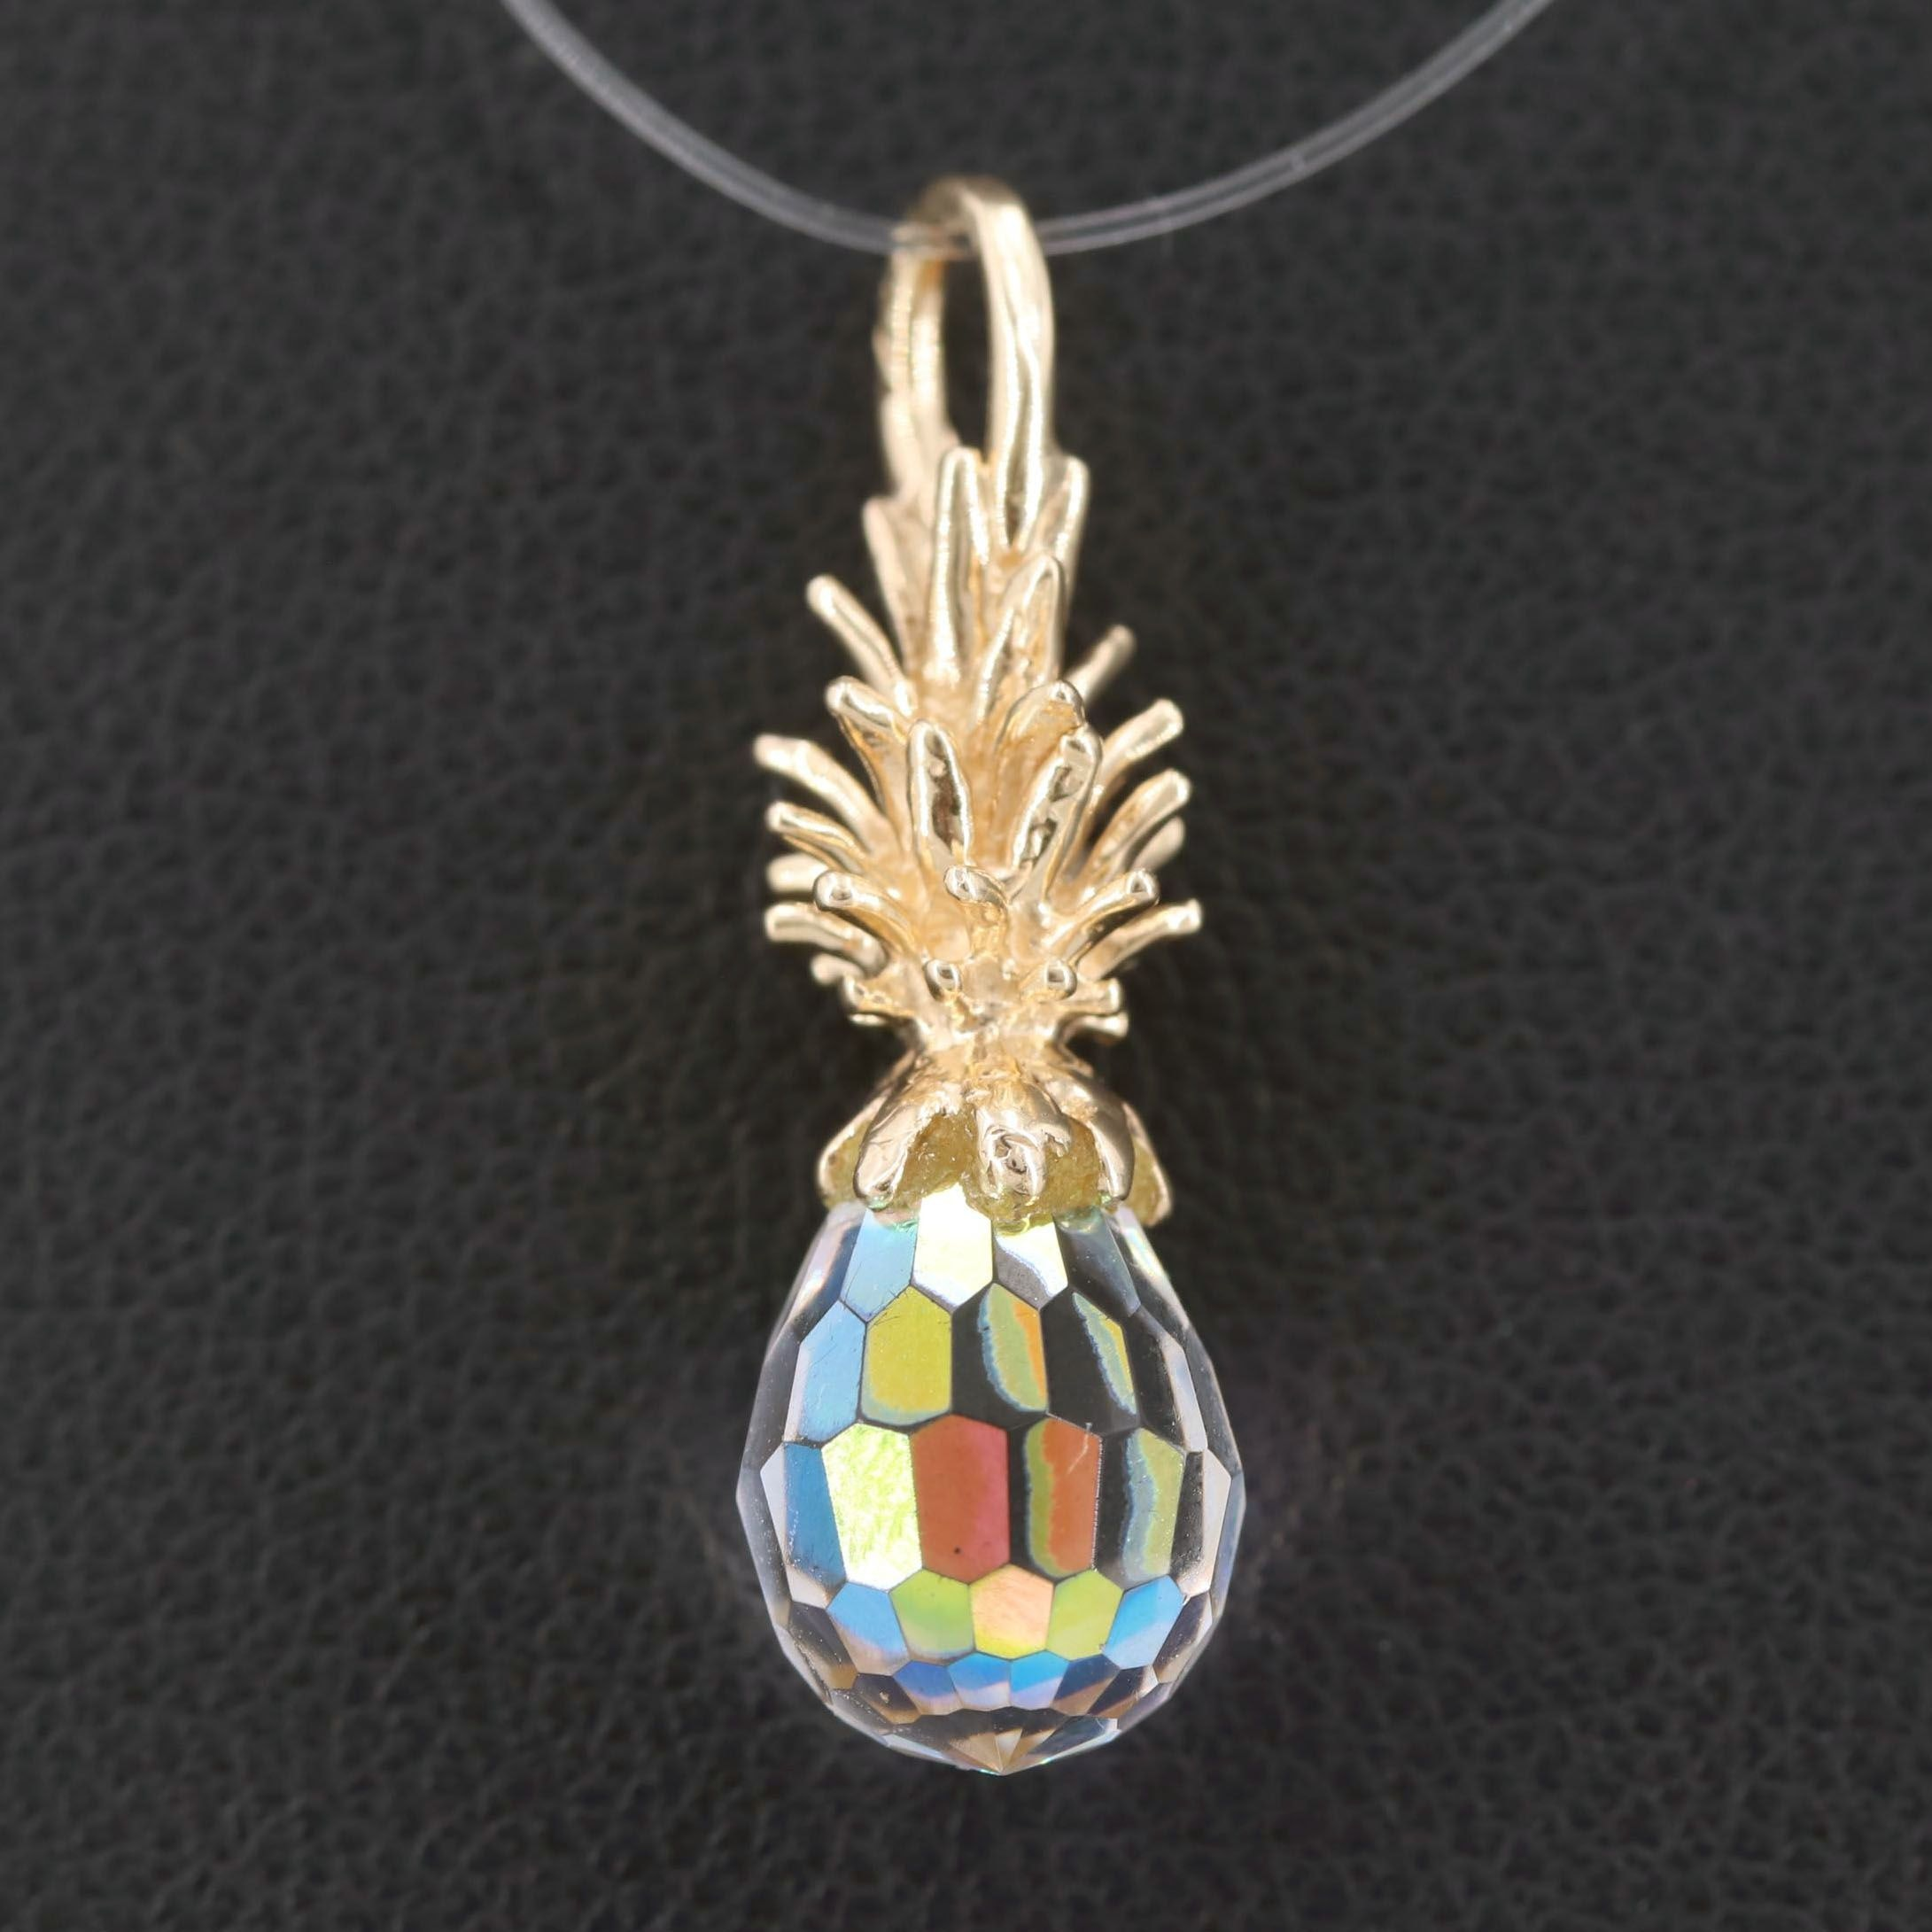 14K Yellow Gold Glass Pineapple Pendant